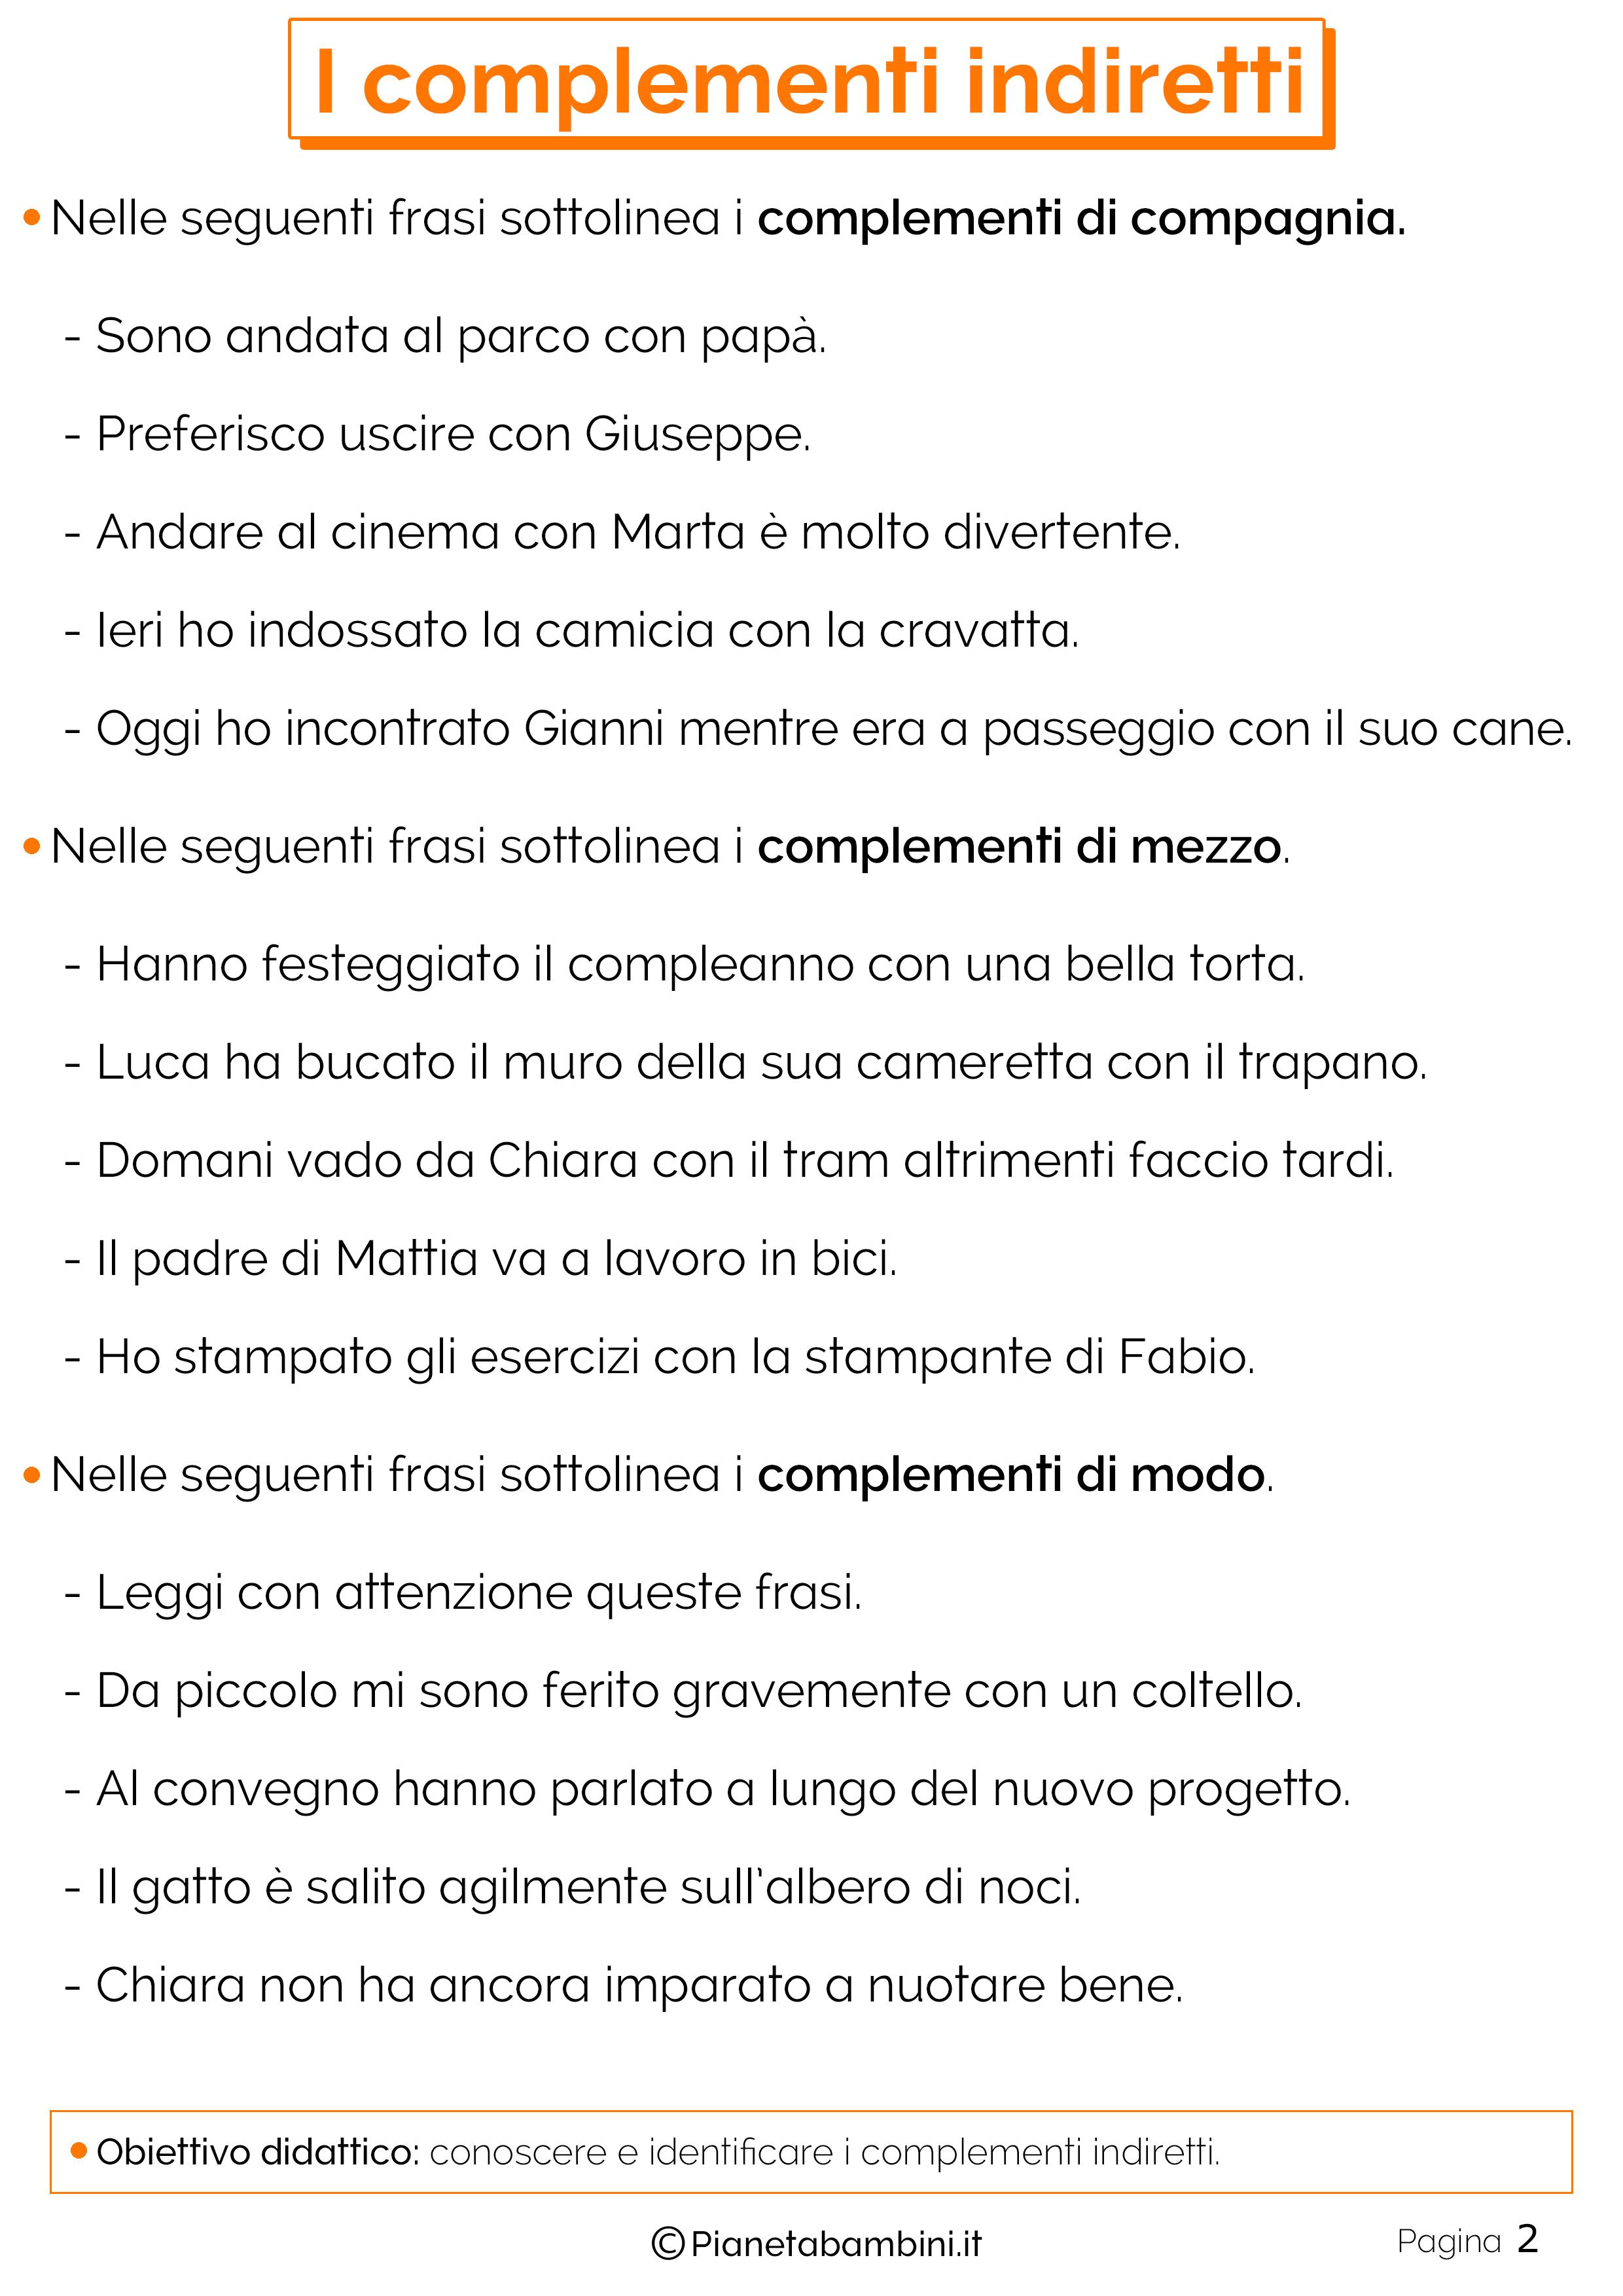 Esercizi sui complementi indiretti n.2